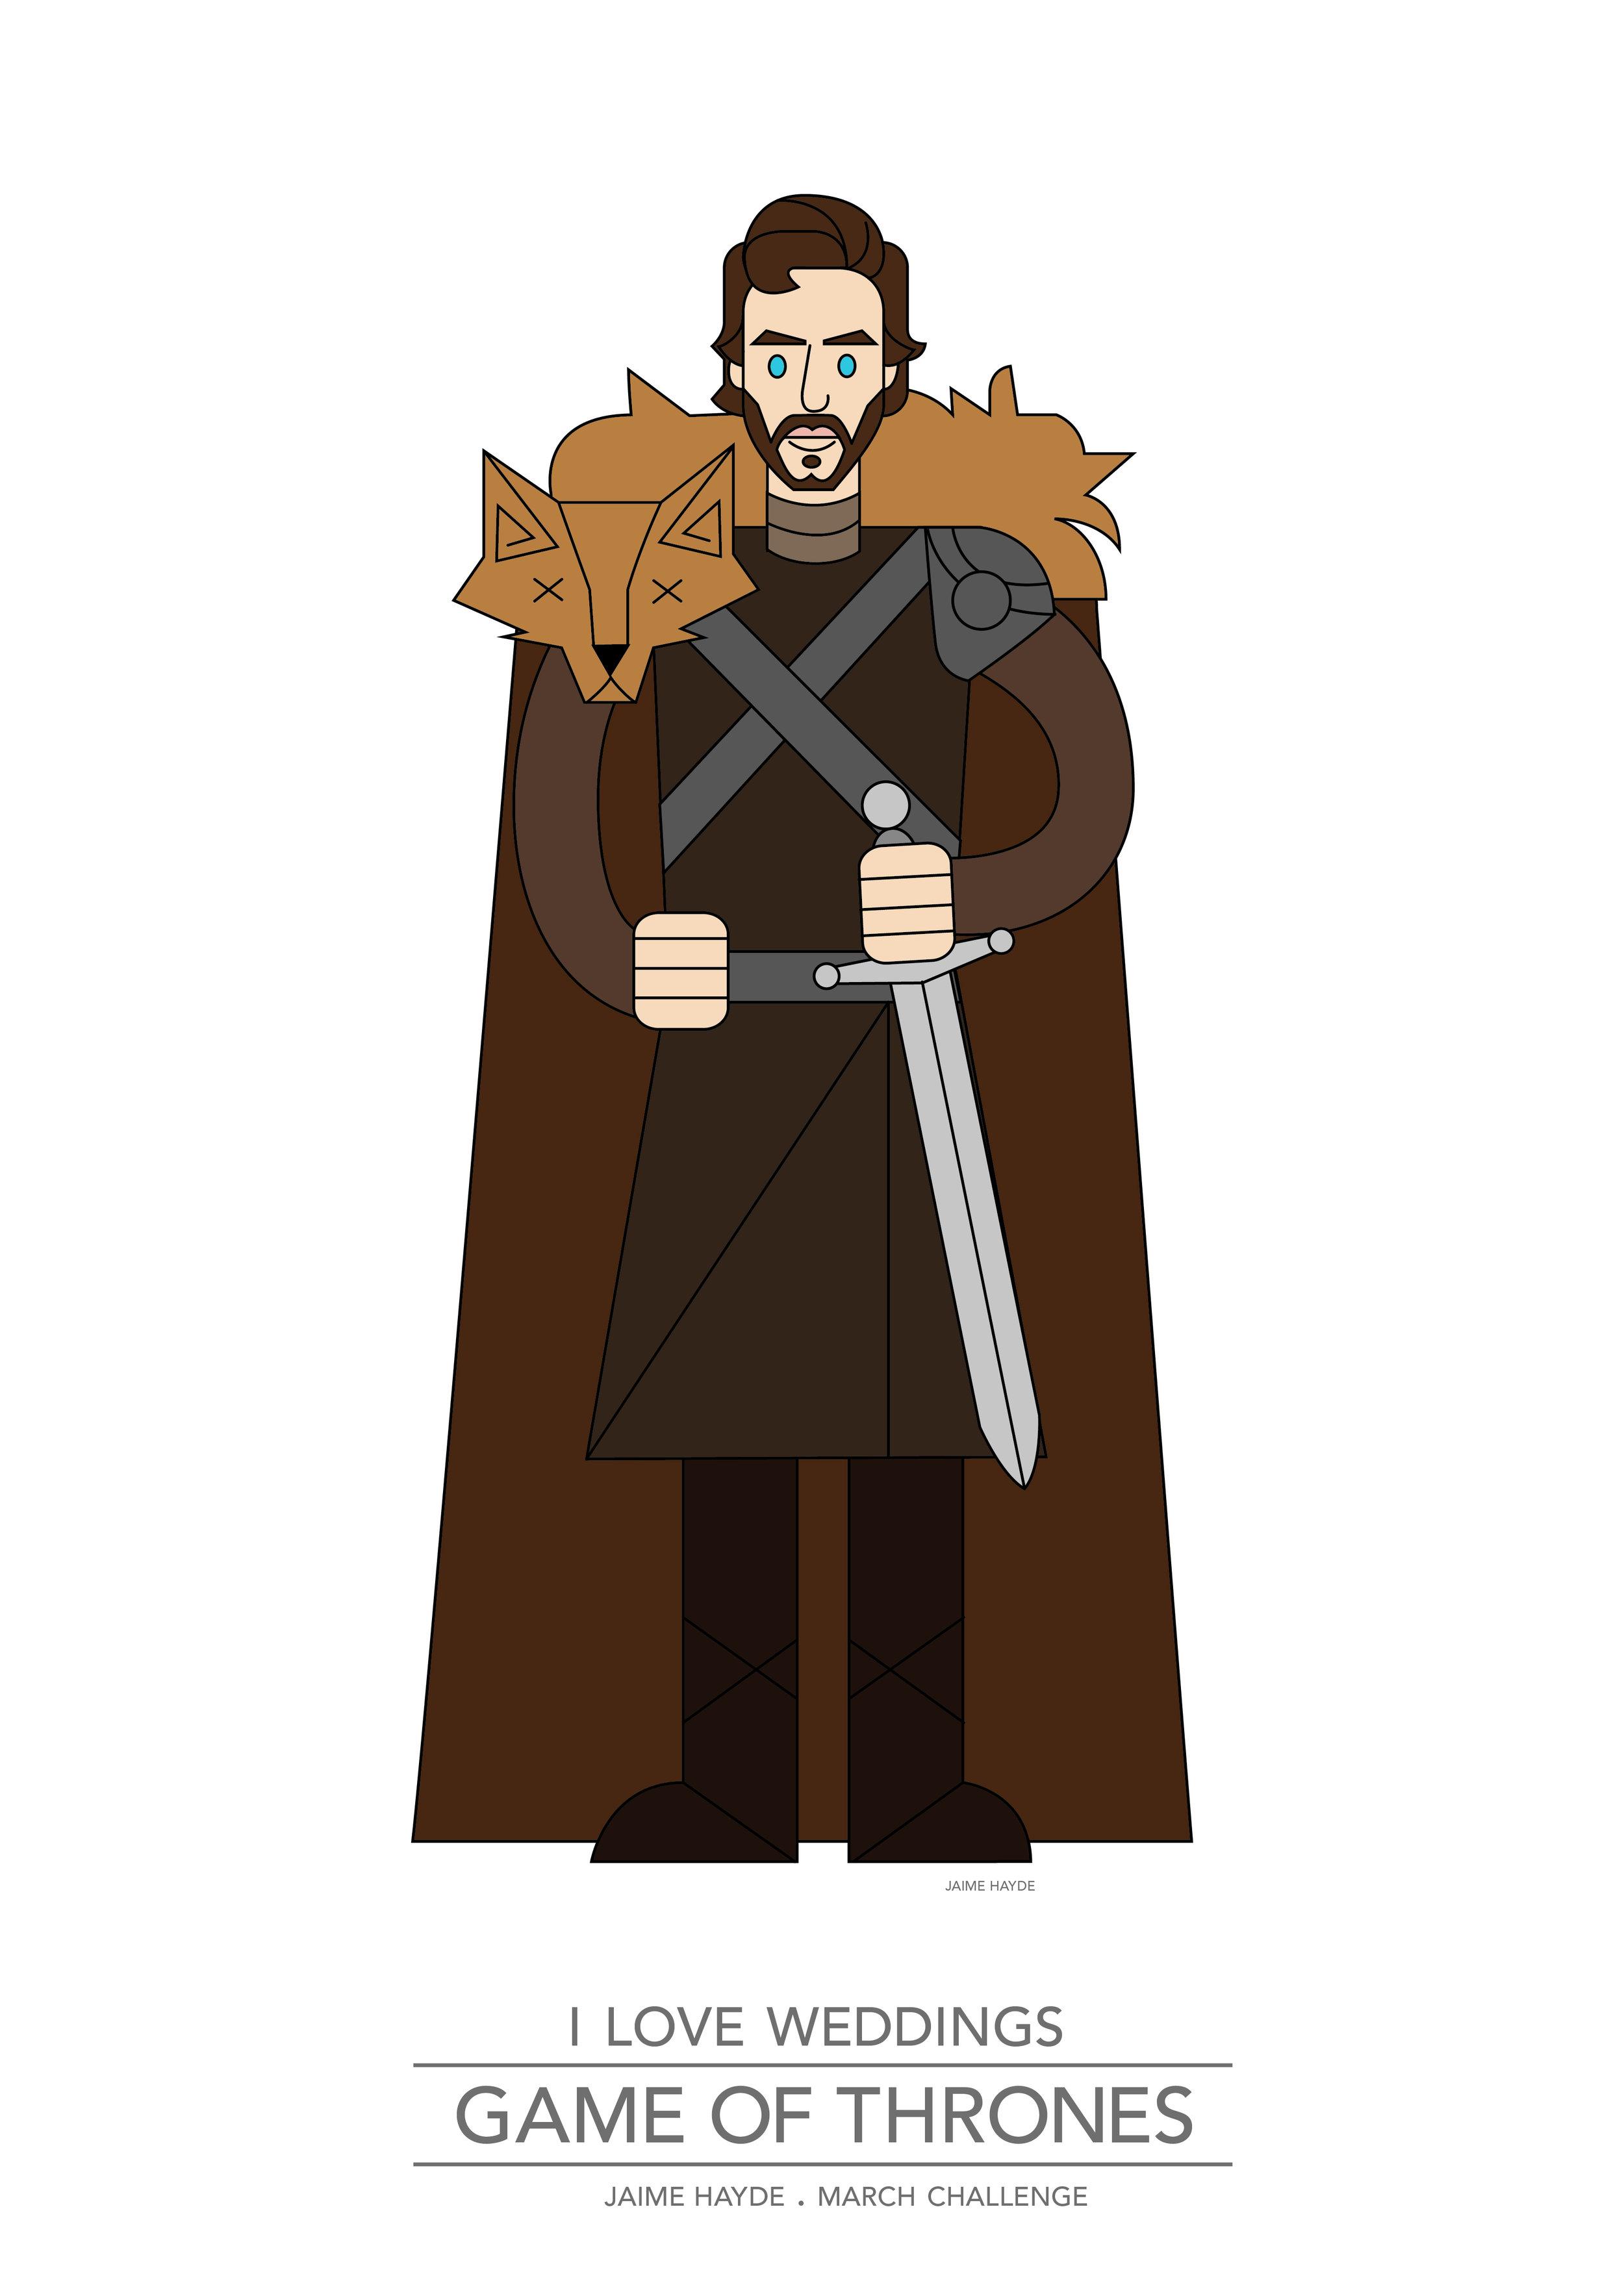 Game-of-thrones-Juego-de-tronos-rob stark.jpg